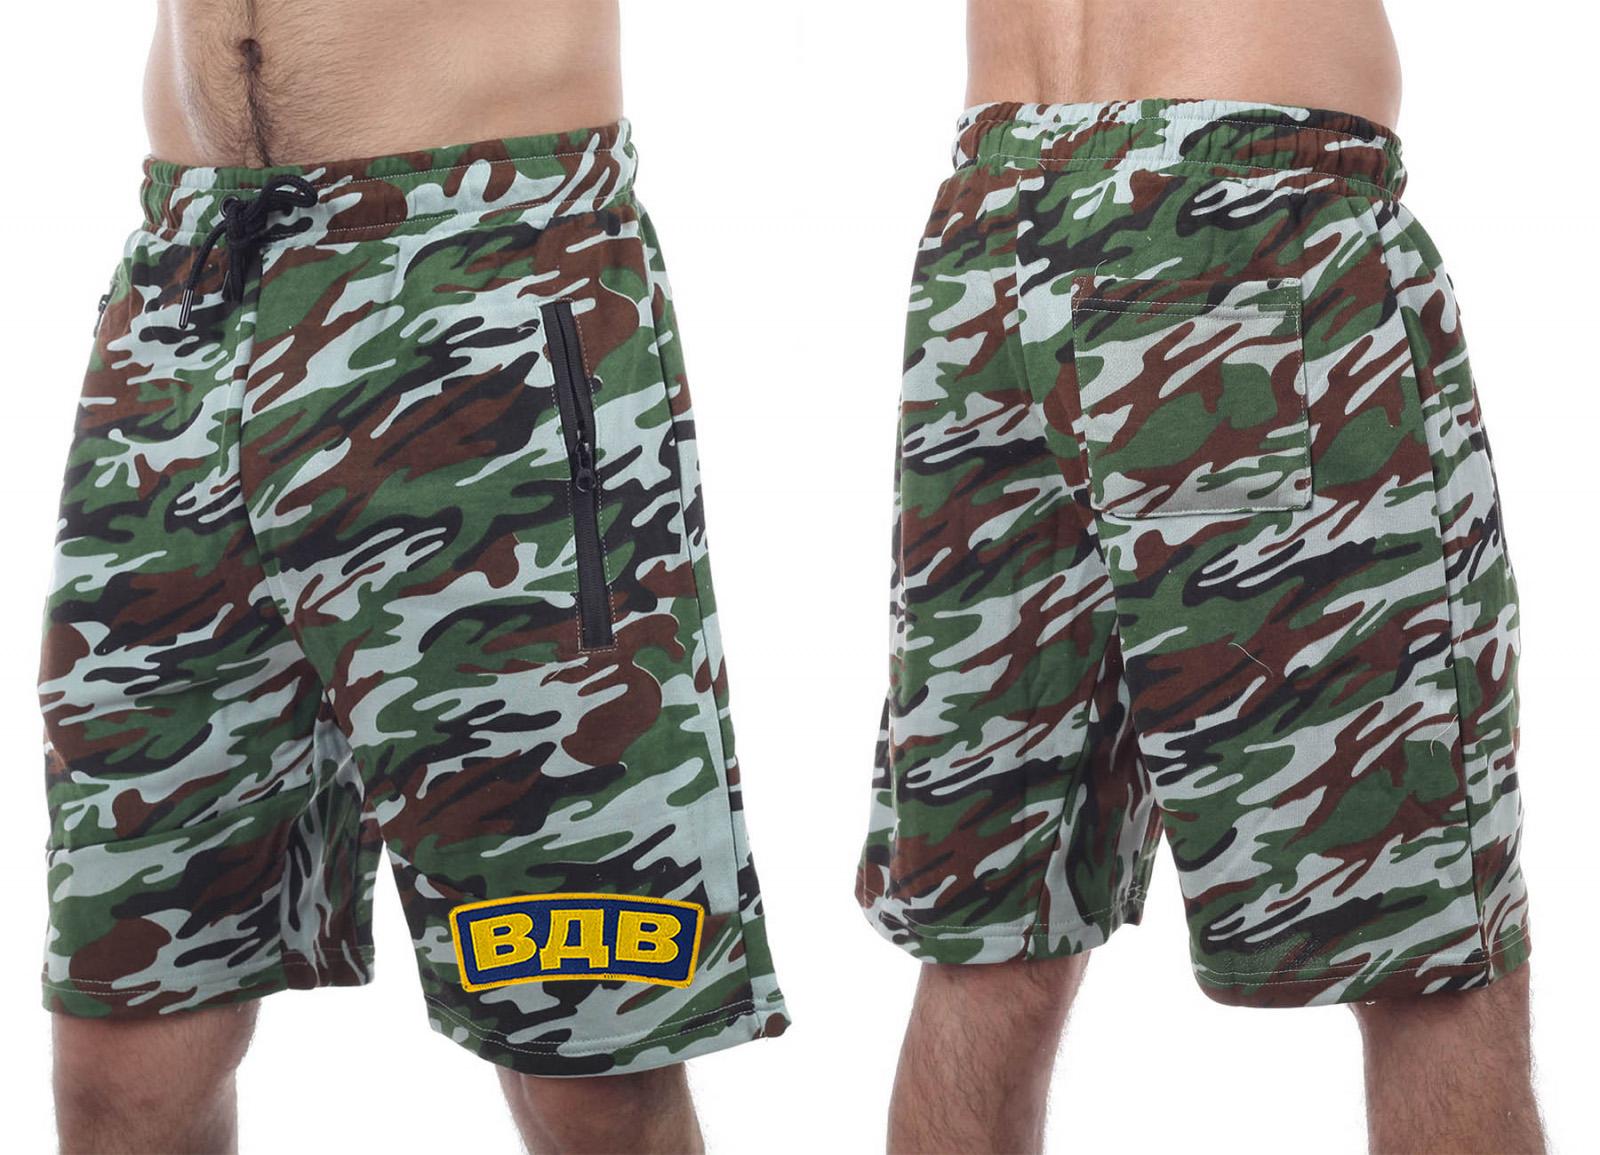 Армейские мужские шорты ВДВ от гуру стиля милитари – ТМ New York Athletics.